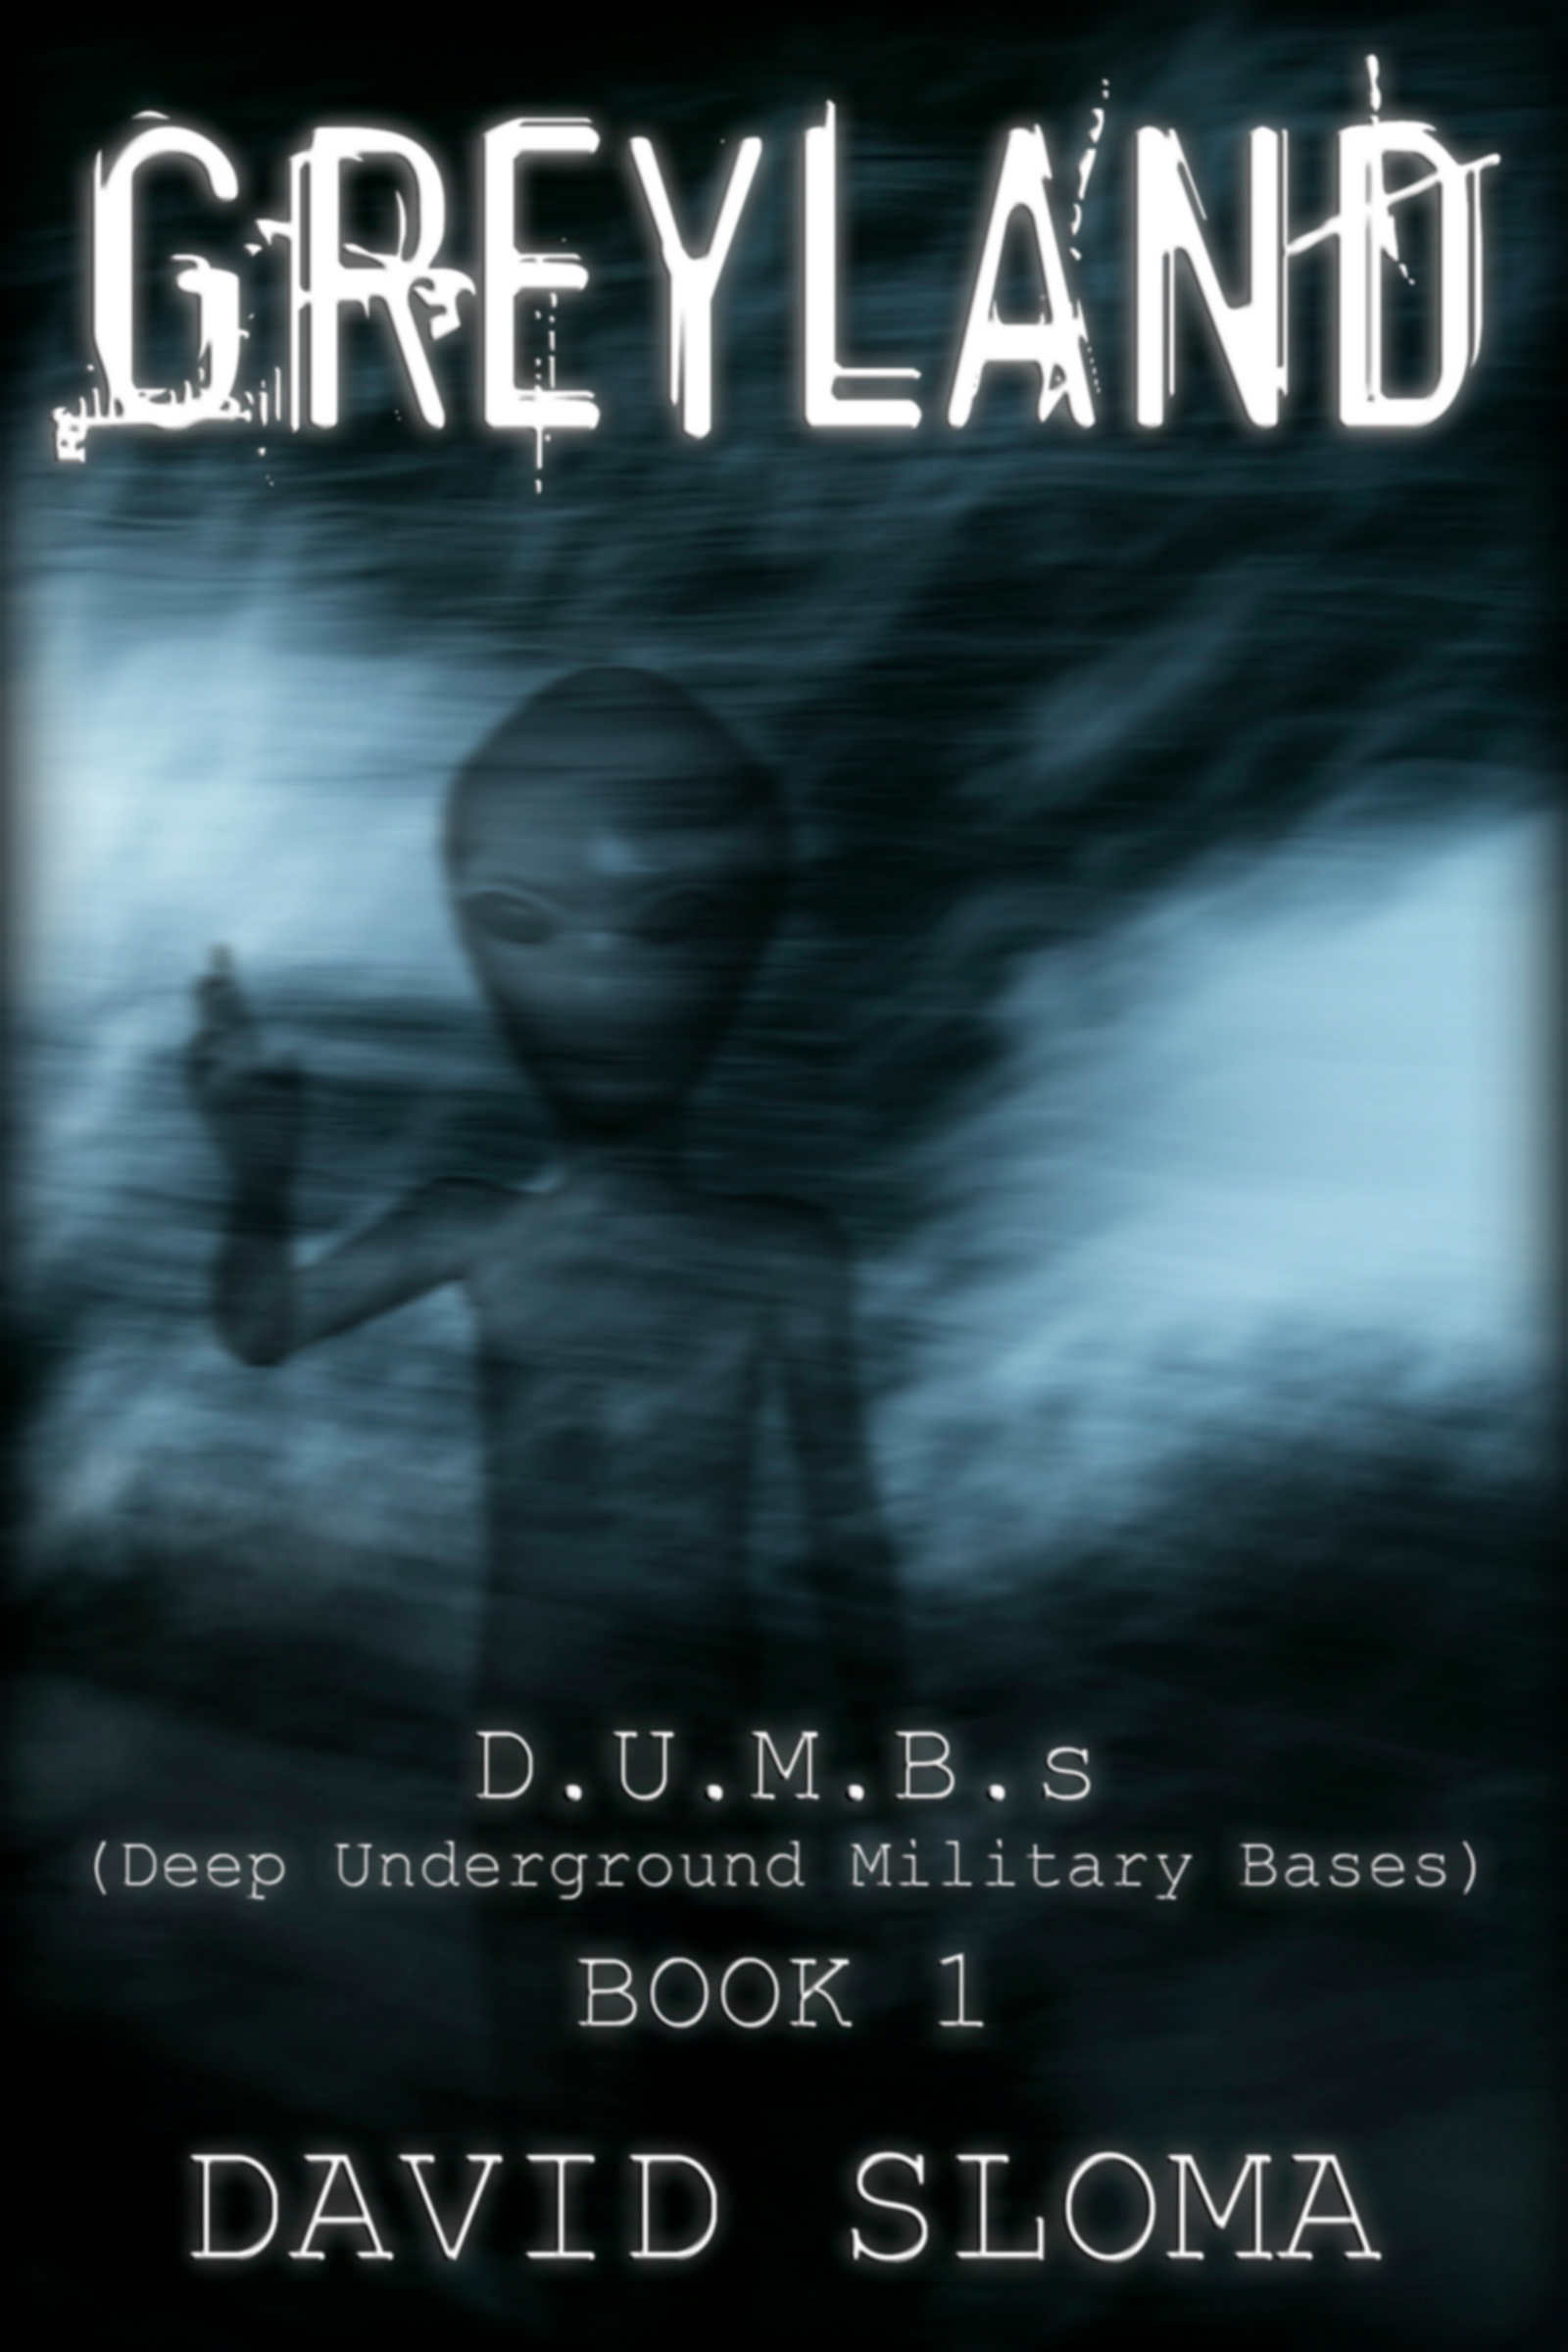 Greyland: D.U.M.B.s (Deep Underground Military Bases) – Book 1